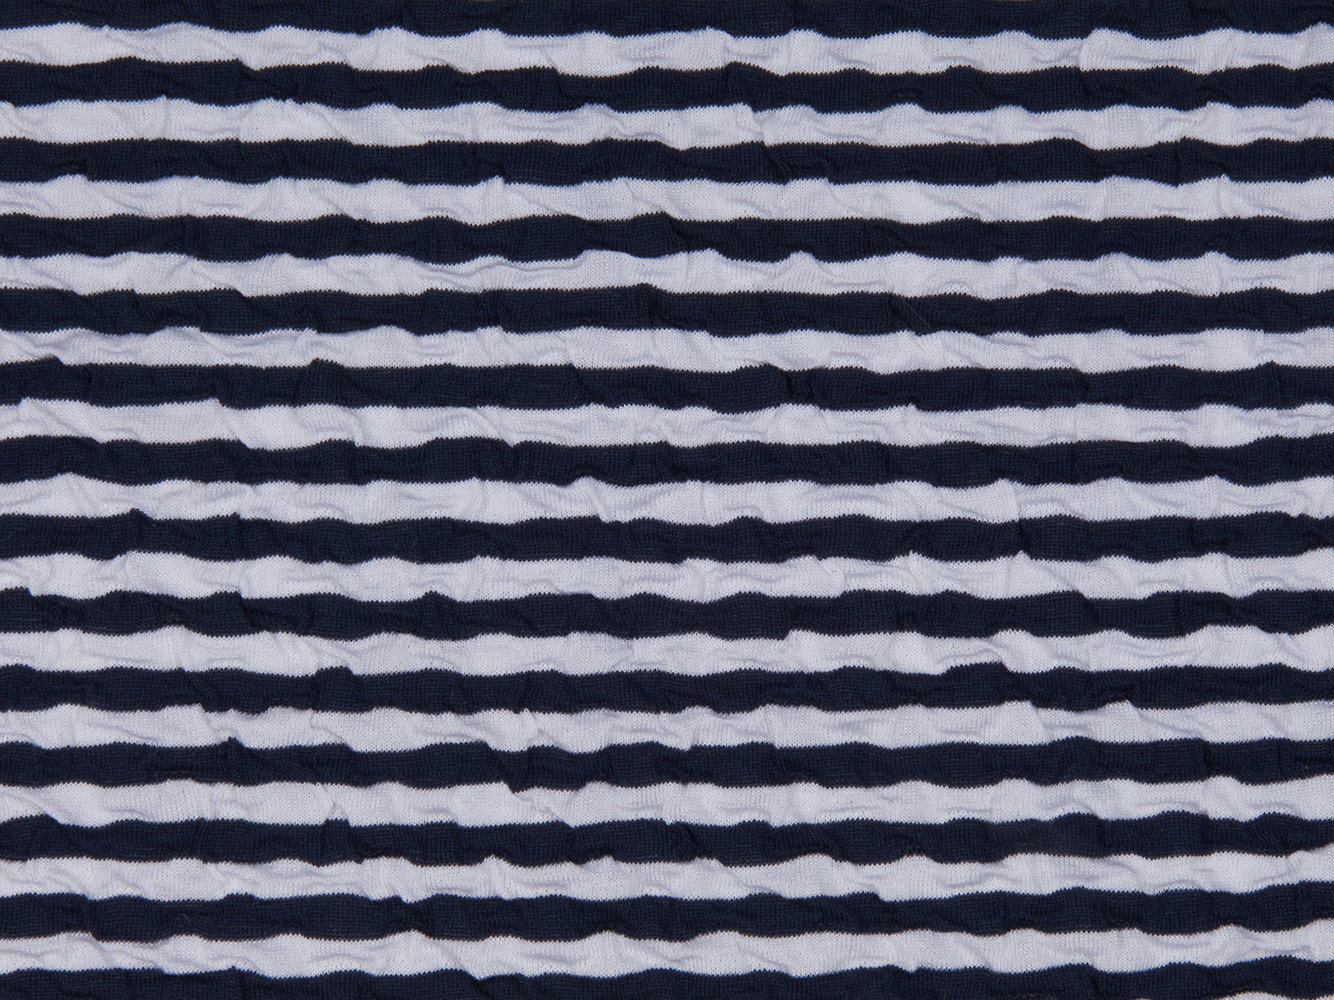 cloqu stretch weiss blau gestreift stoffzentrale ag. Black Bedroom Furniture Sets. Home Design Ideas